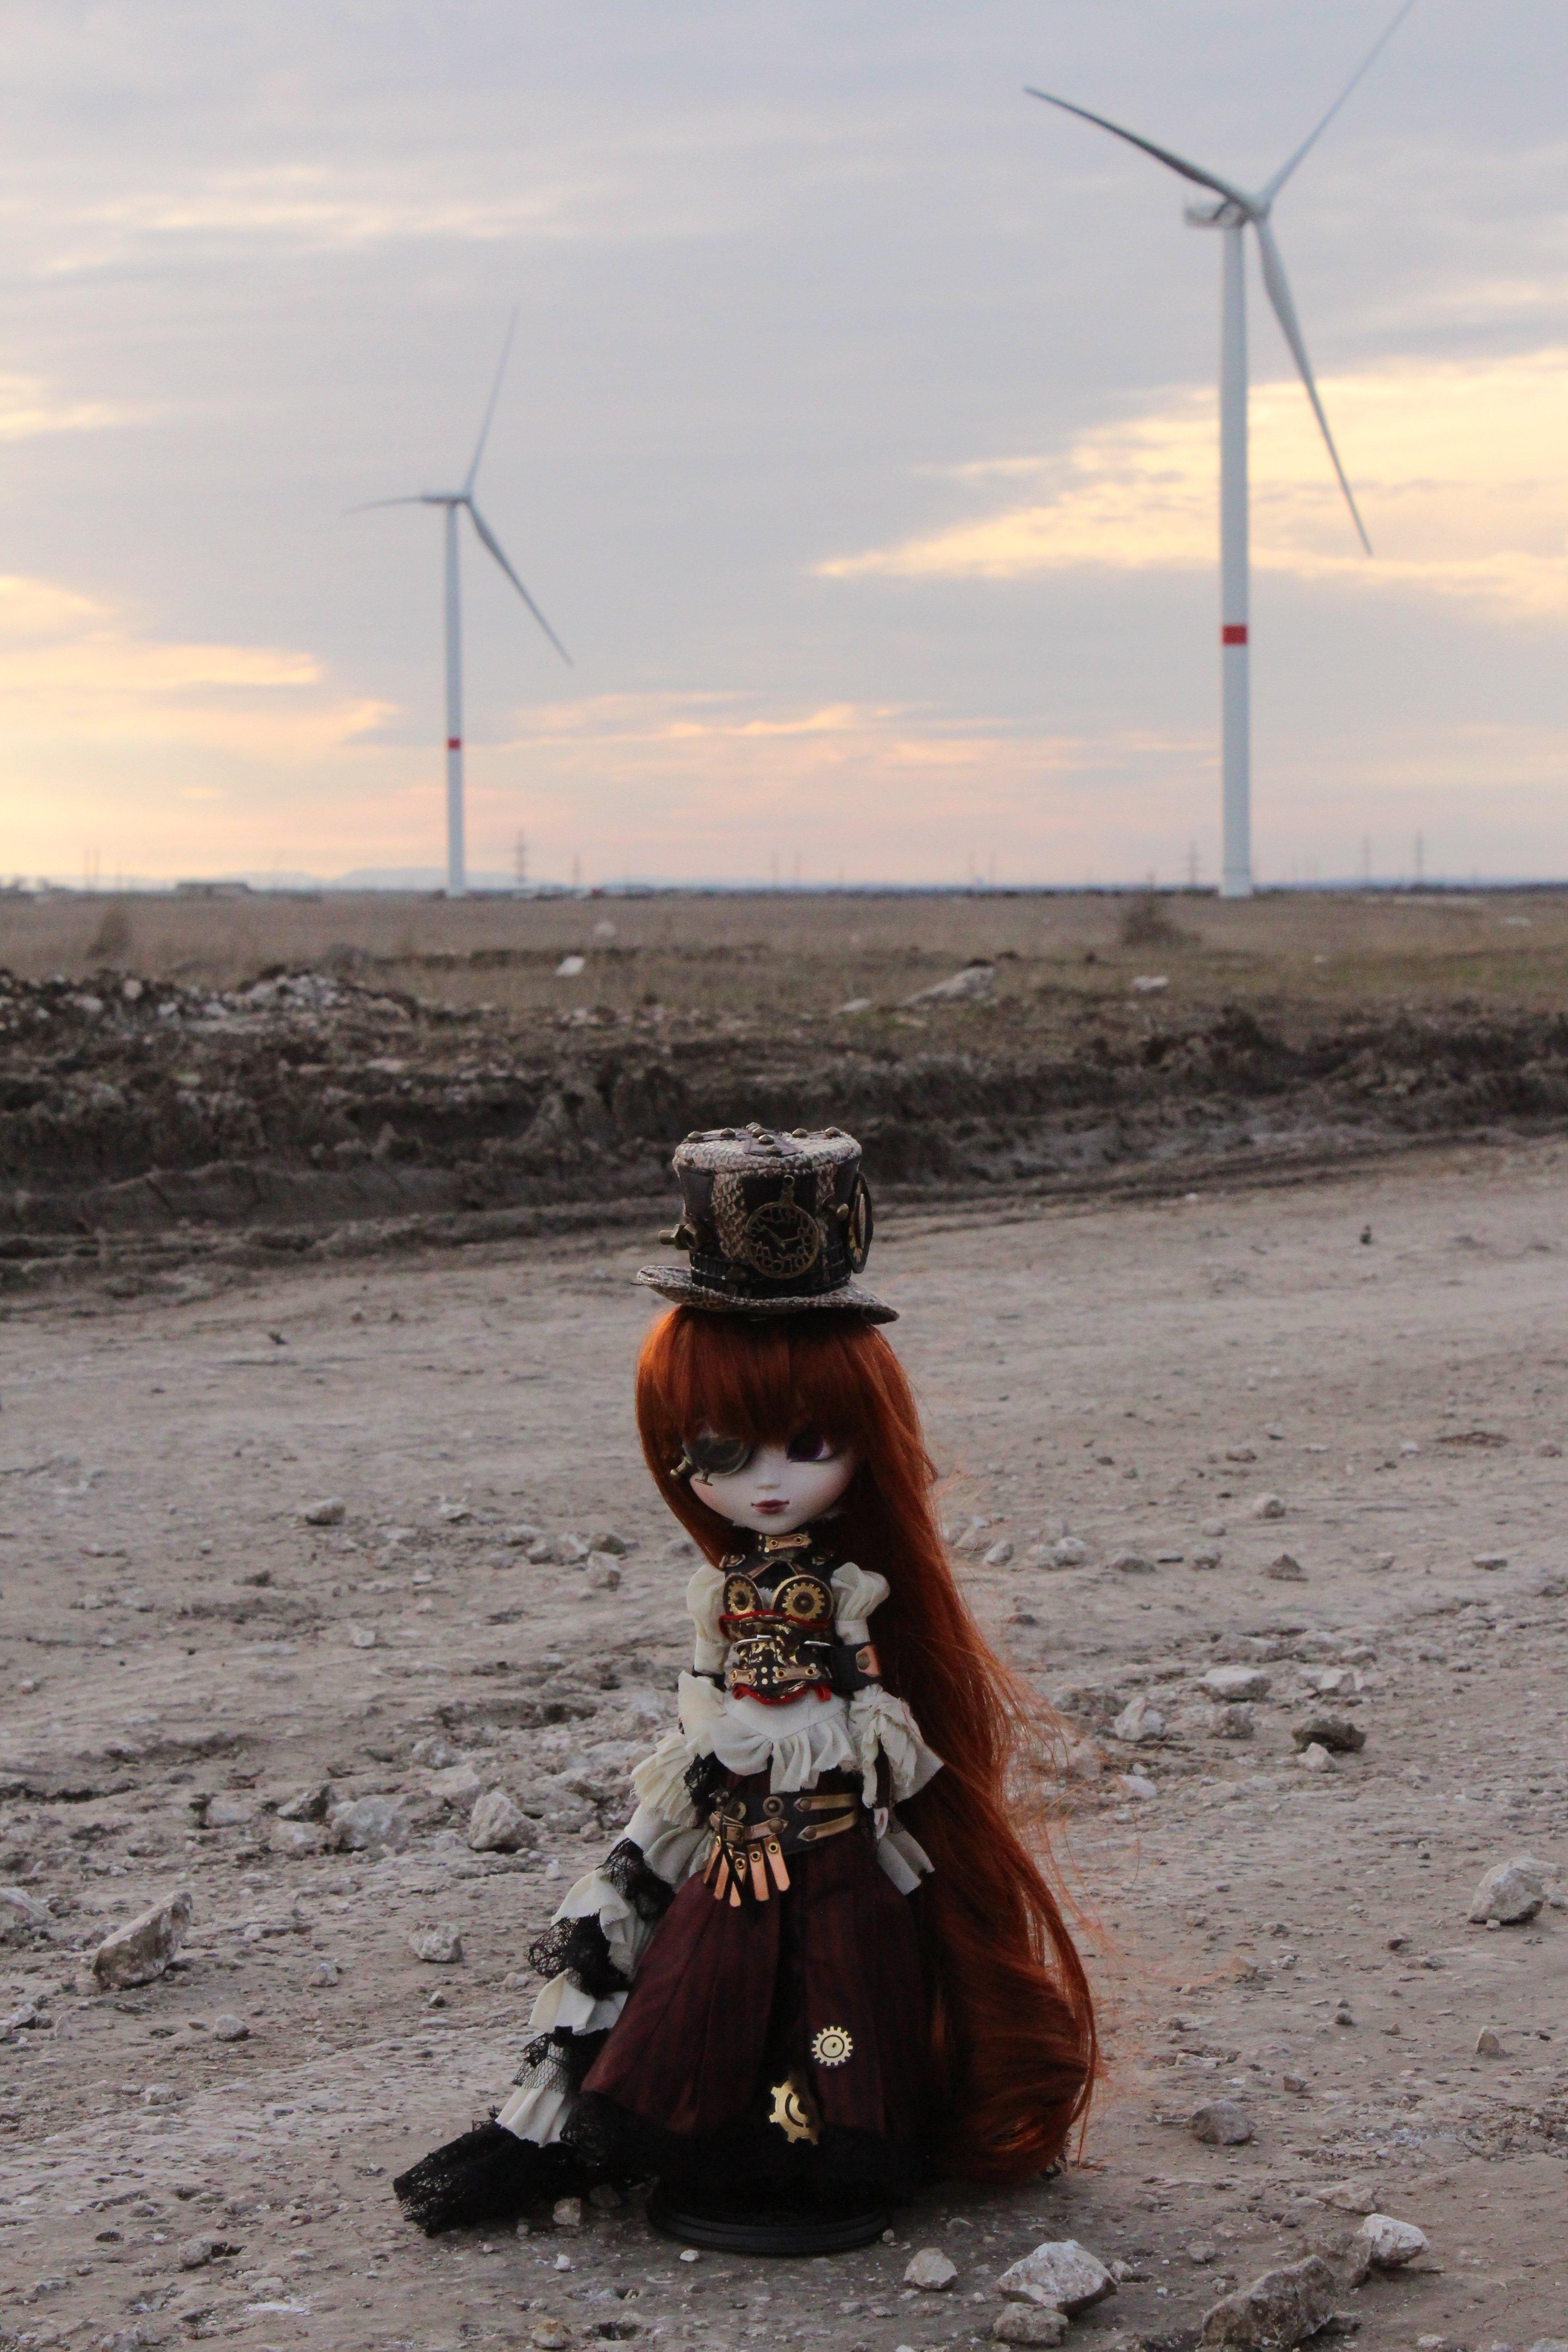 Сет STEAMPUNK Project ~Second Season~ eclipse — декабрь 2012 - Страница 2 96c8d3d97e37